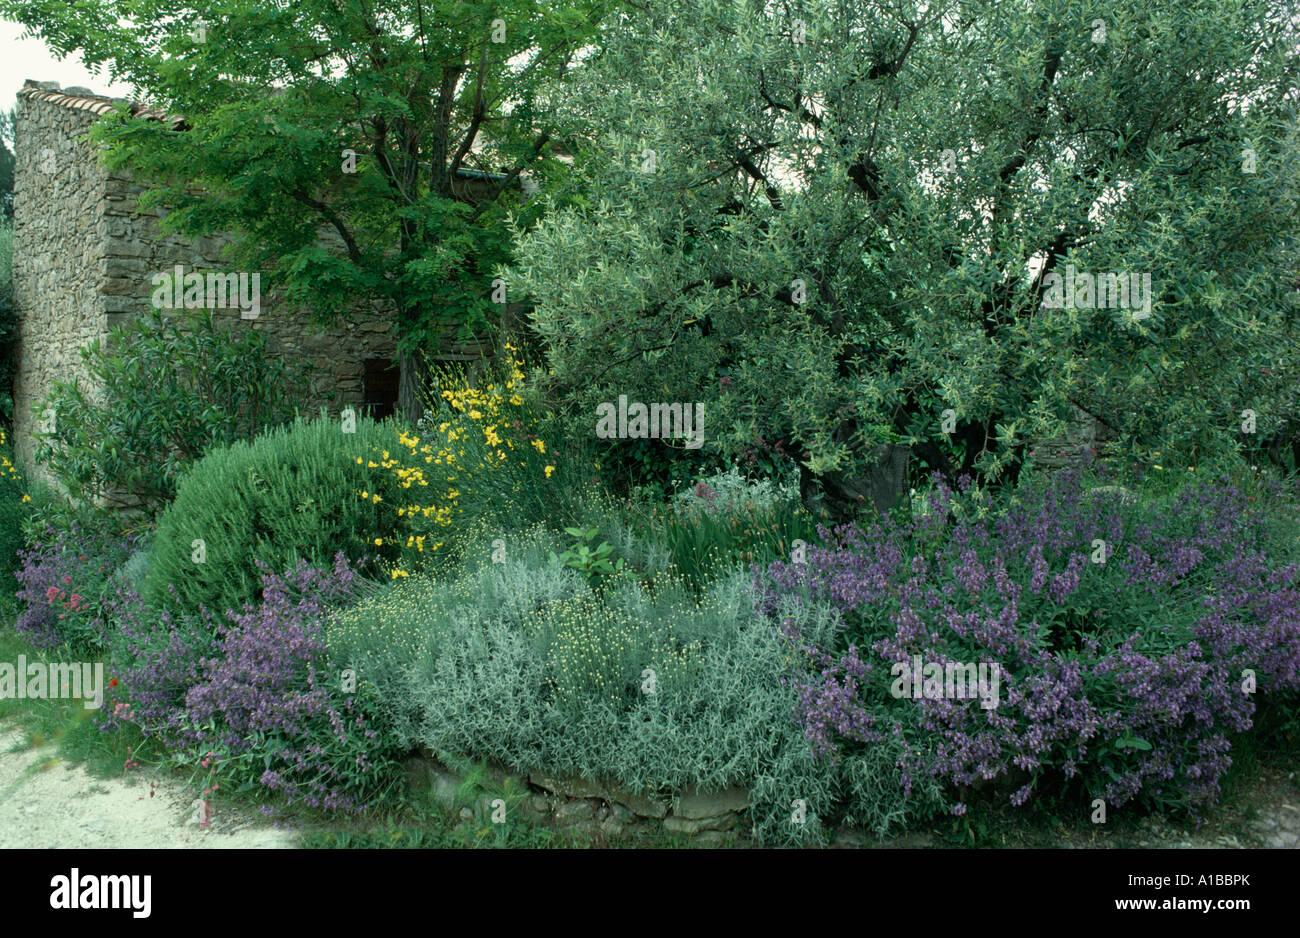 French Country Garden Stock Photos French Country Garden Stock